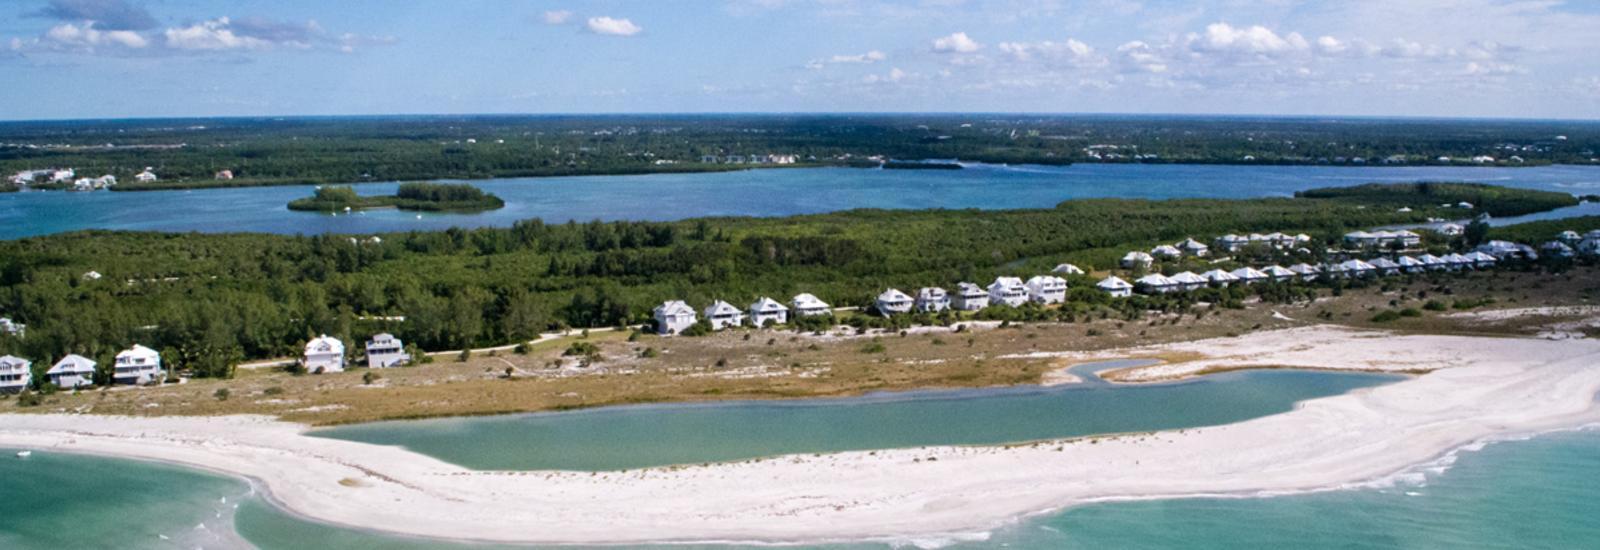 Knight Island / Palm Island Resort